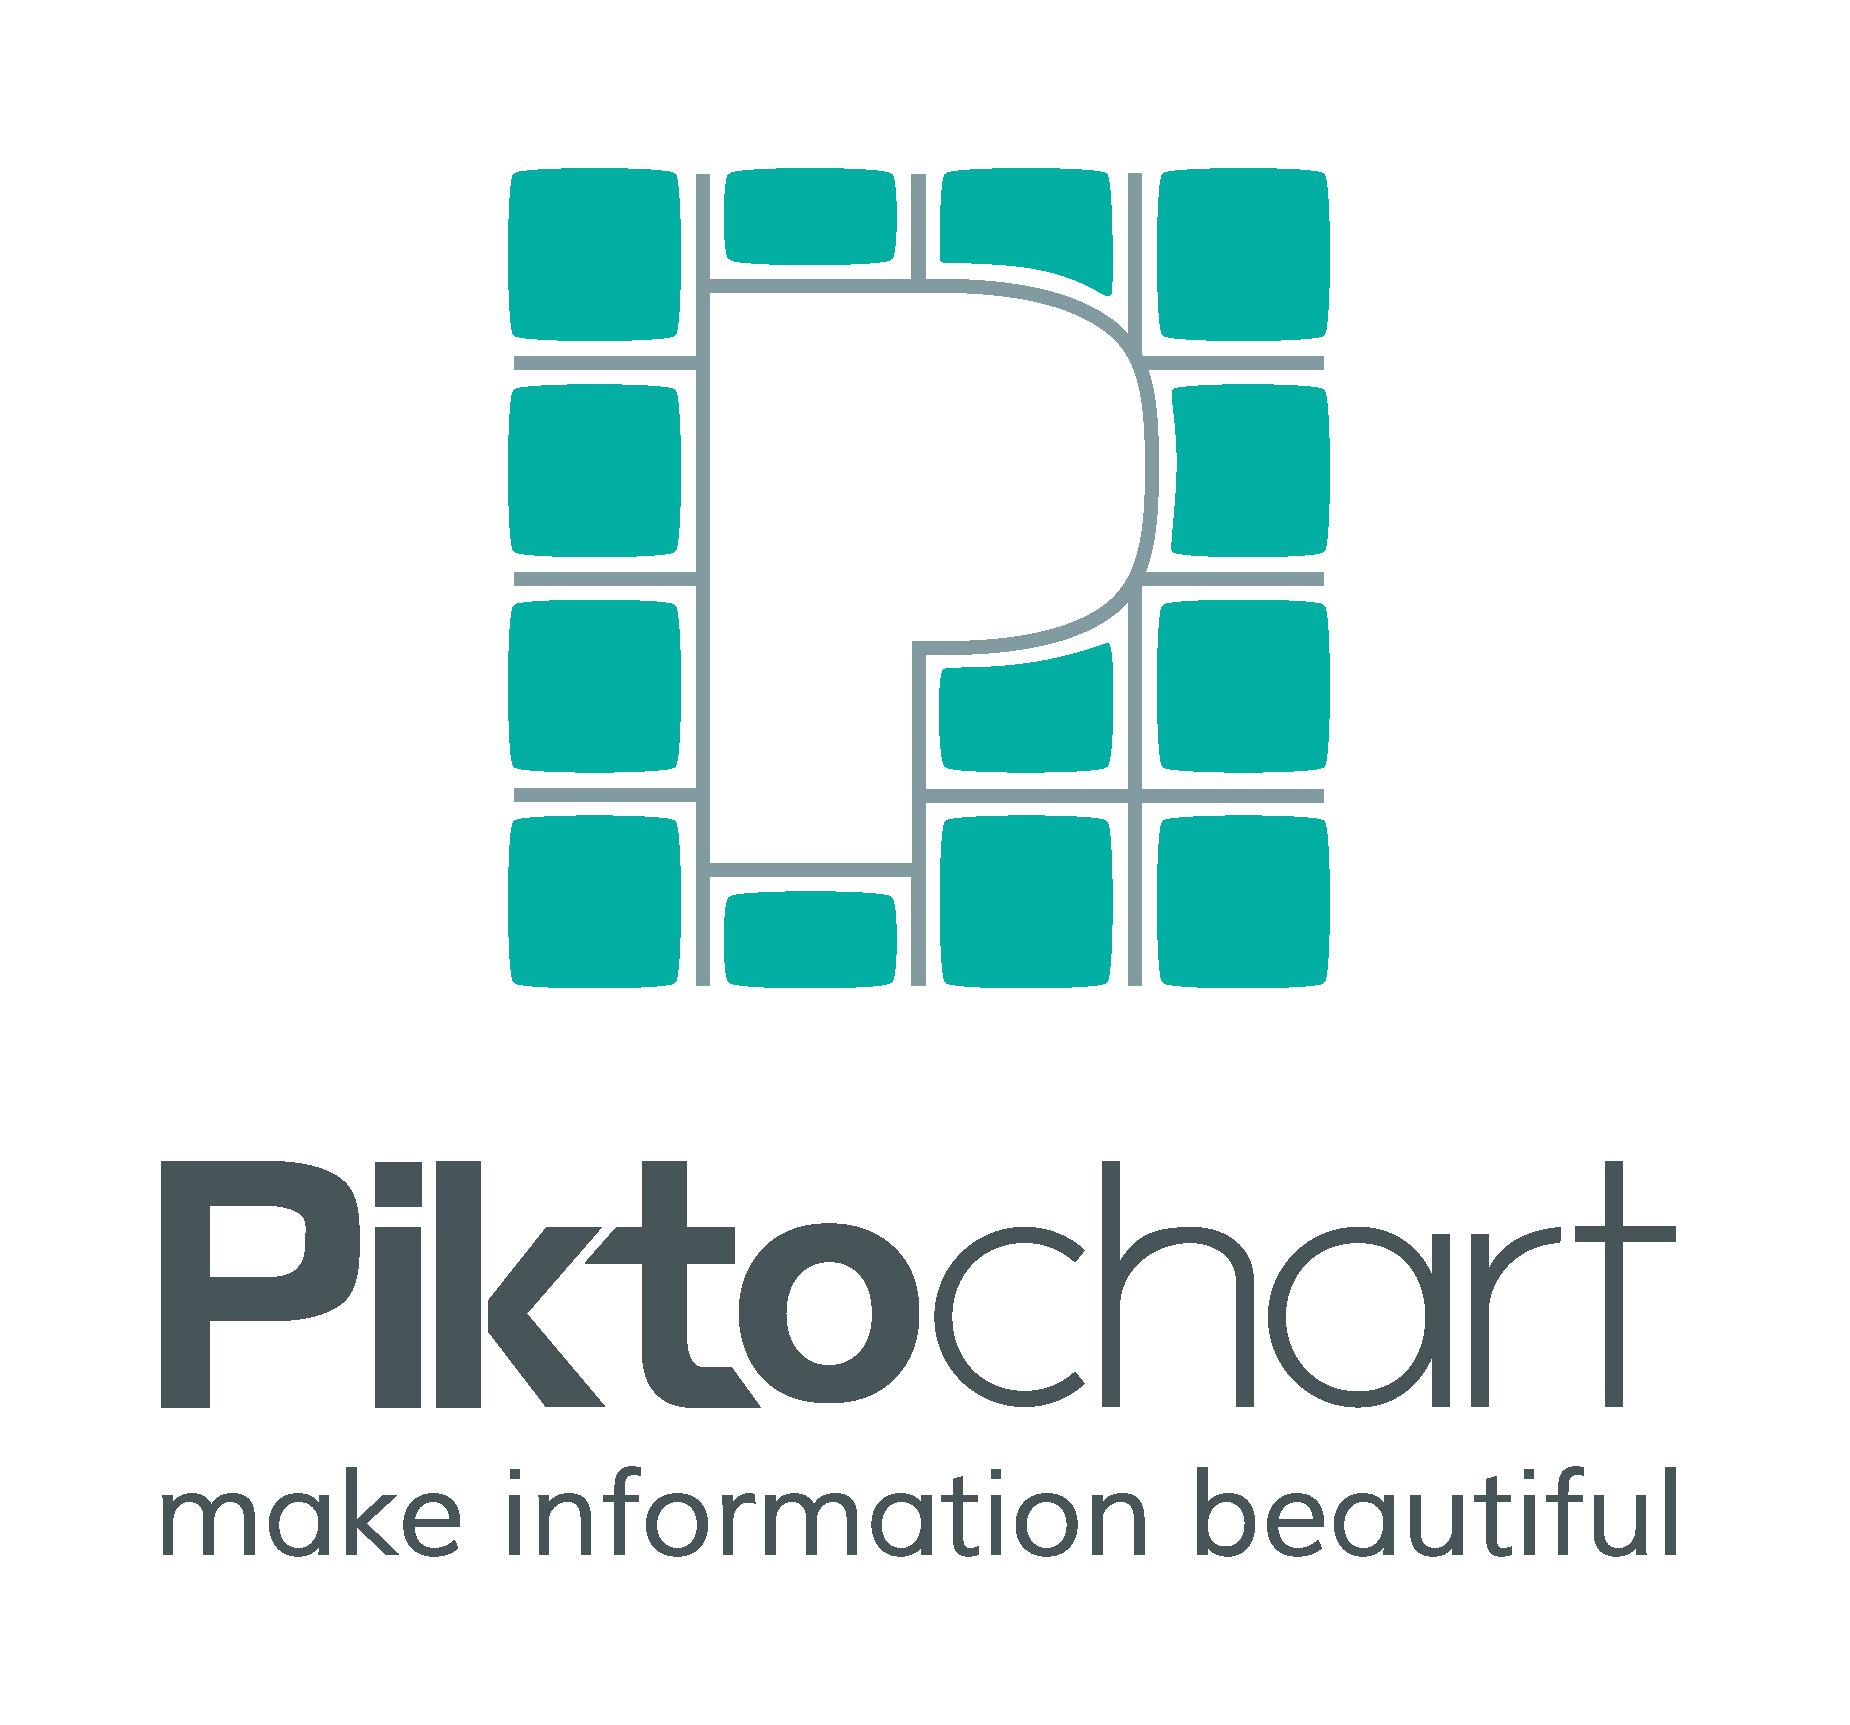 Piktochart